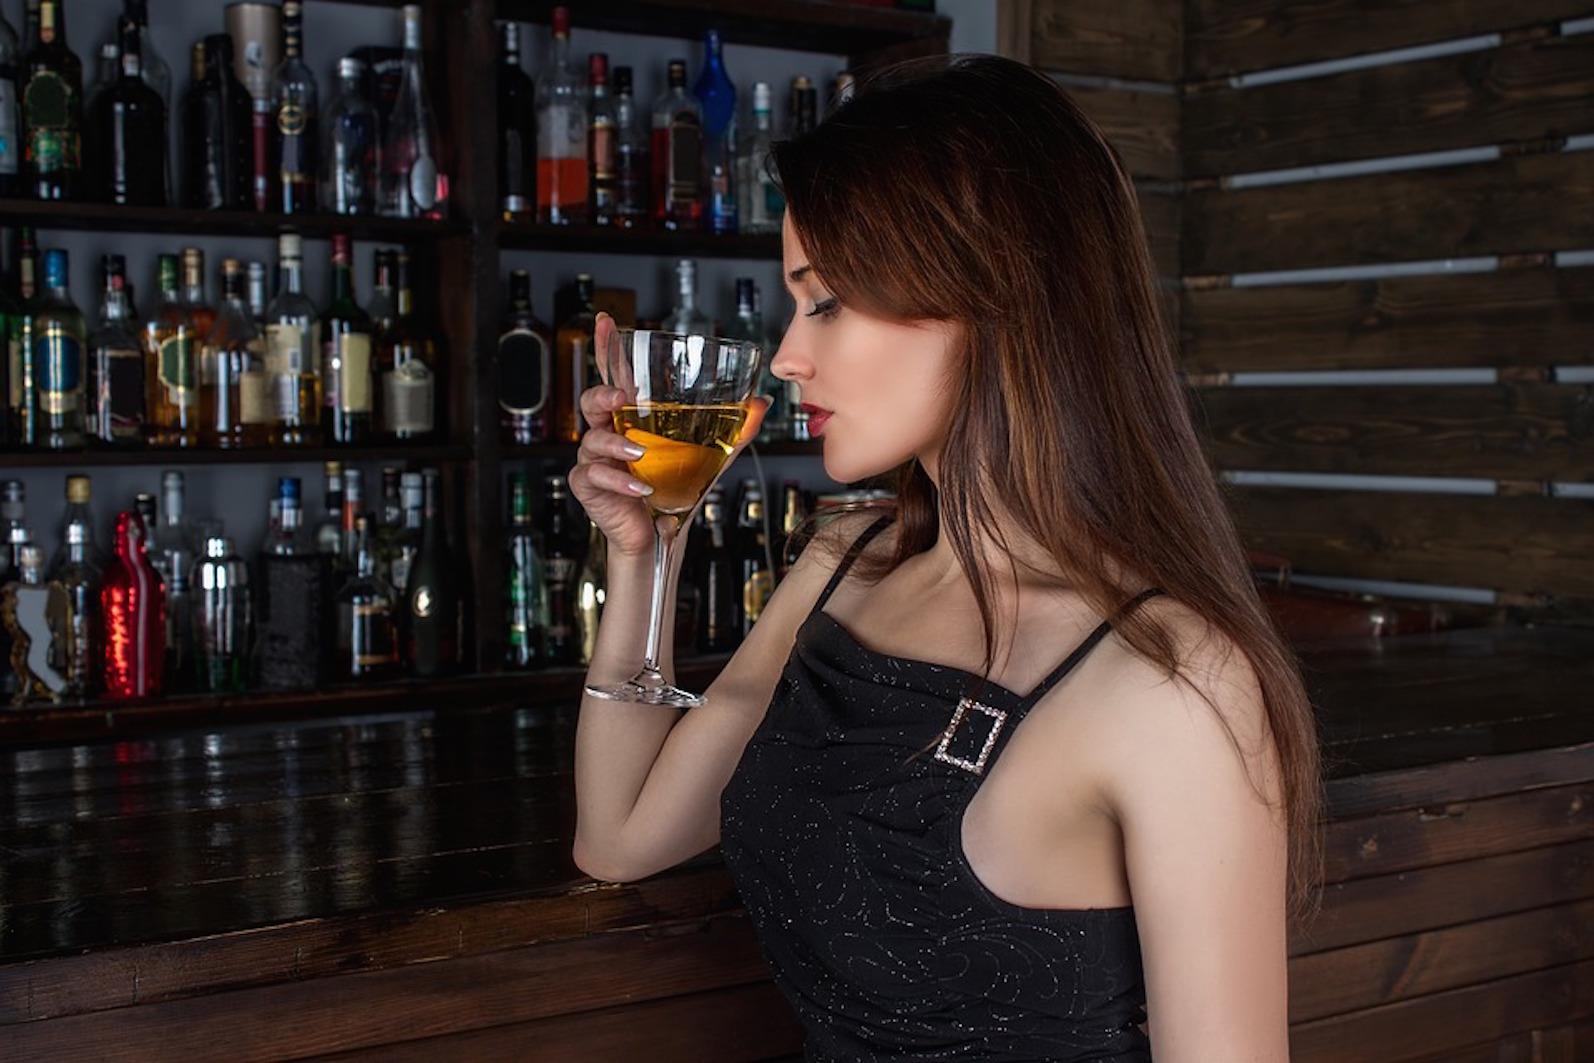 blasenentzuendungheilen blasenentzündung heilen blasenentzündung getränke meiden alkohol kaffee schwarztee kohlensäure softdrinks cystitis harnwegsinfektion harnwegsinfekt